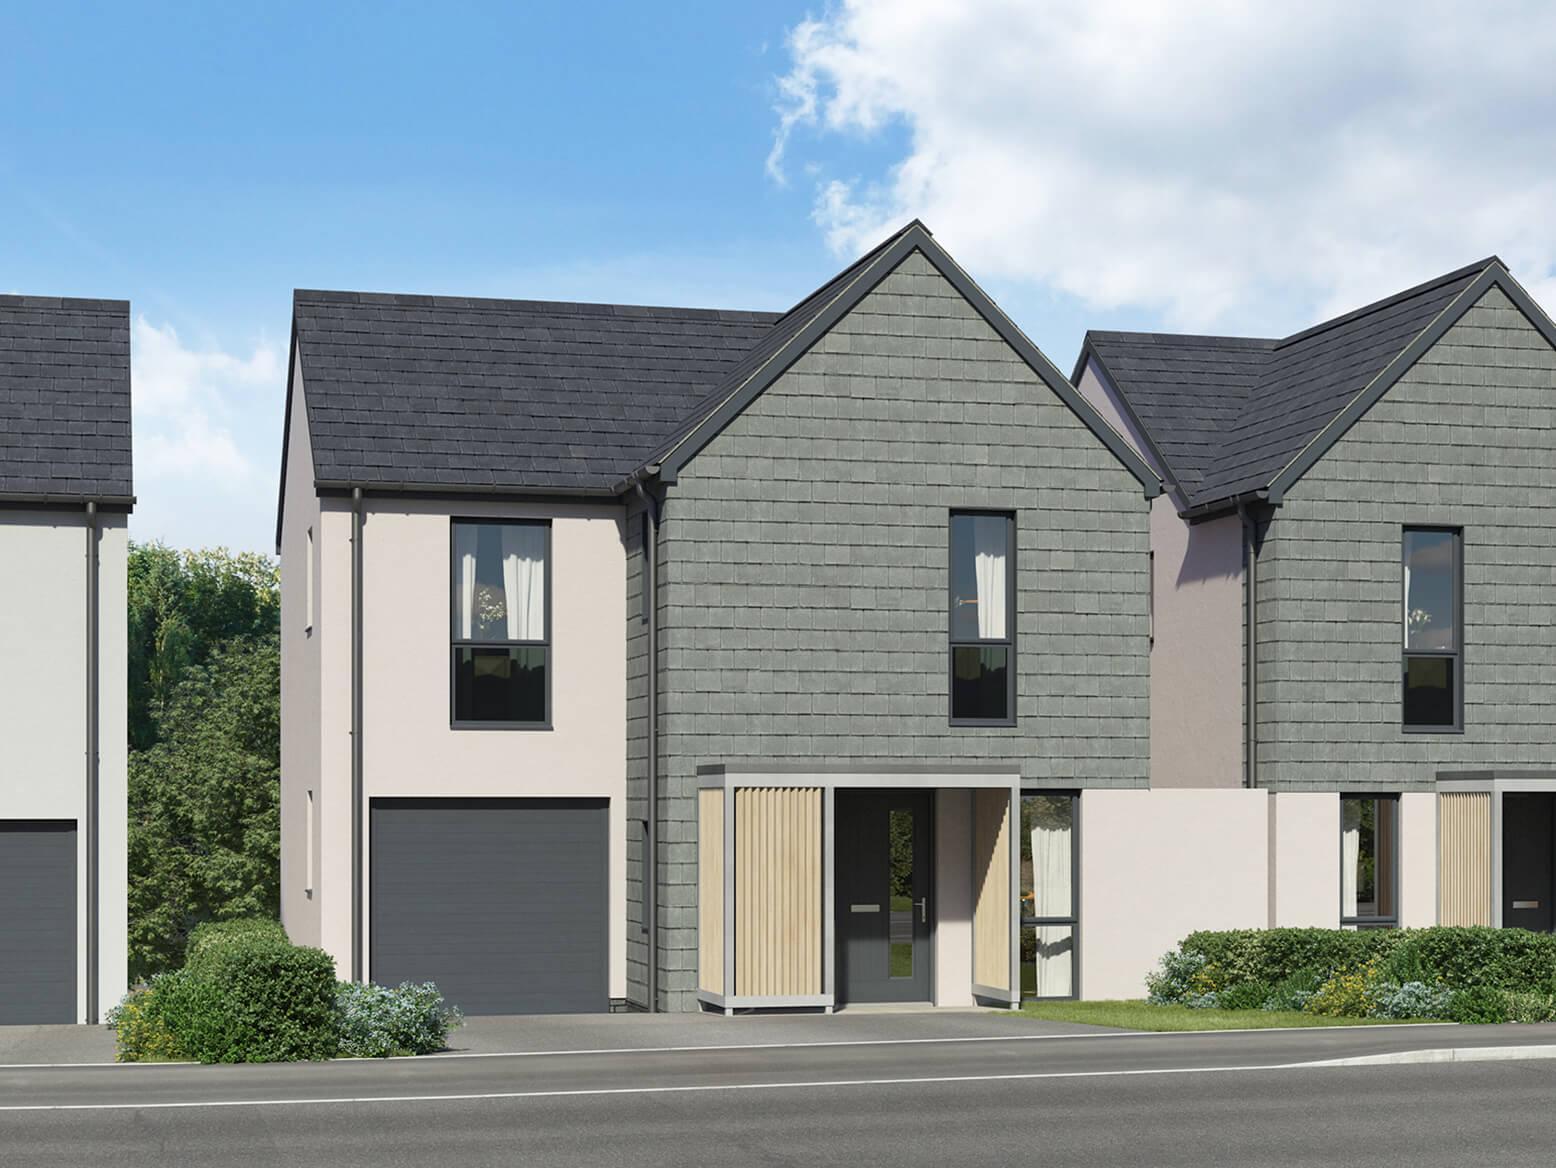 Applegate Park Kingsbridge New Build Home Main Thurlestone